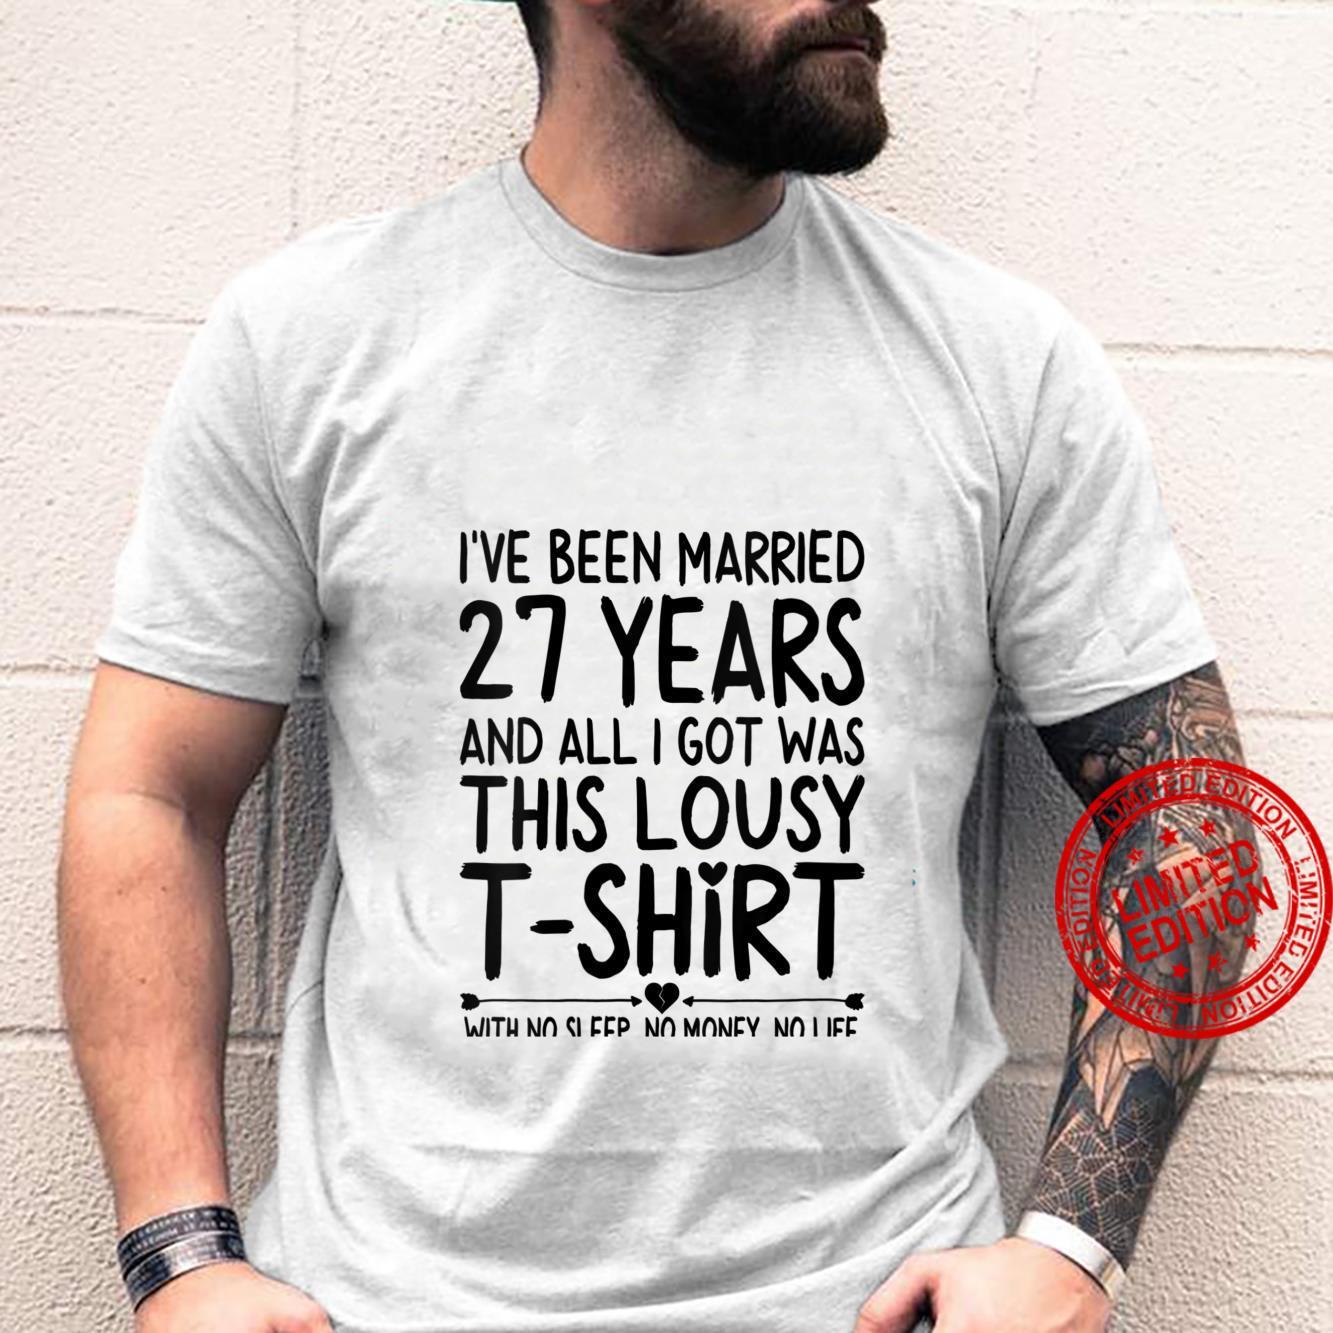 Womens 27th Wedding Anniversary Shirt for Her & Him Humor Marriage Shirt